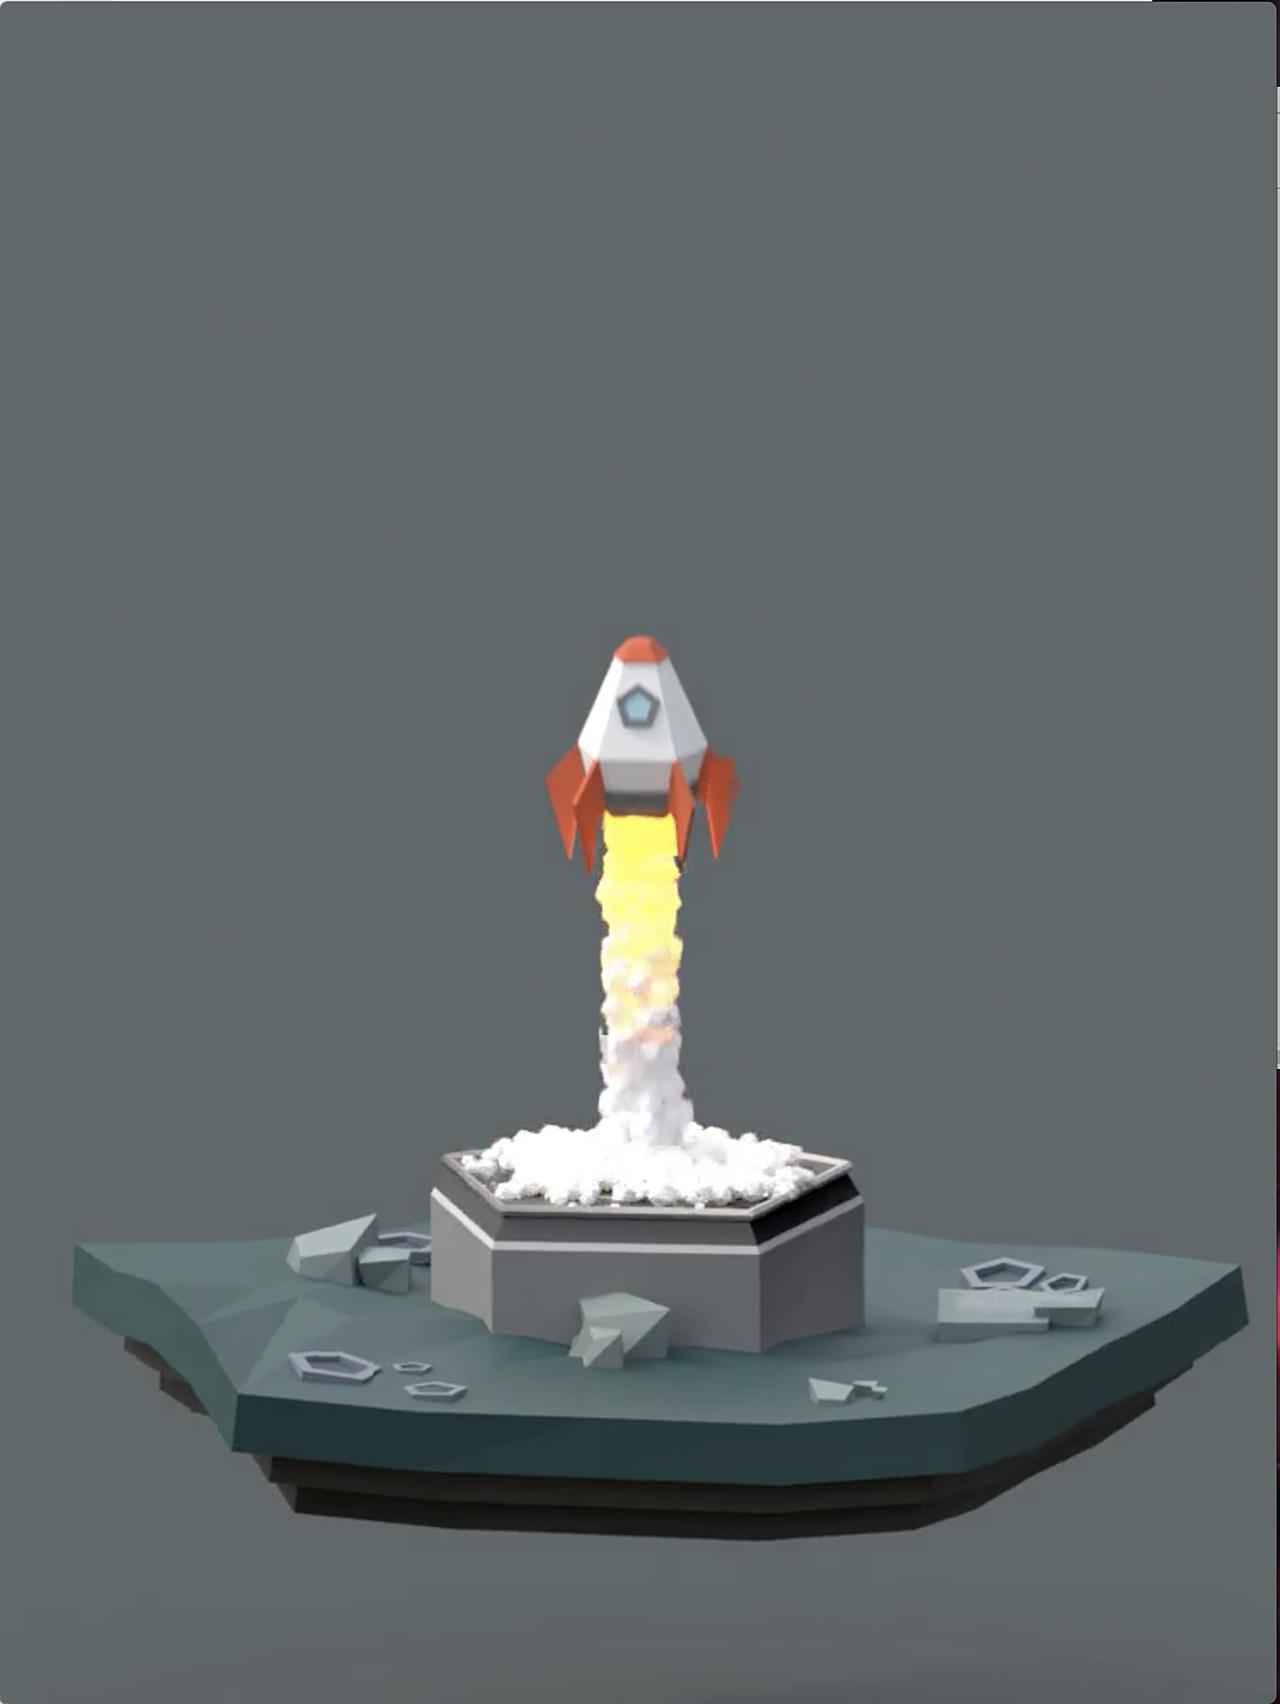 My Rocket Animation